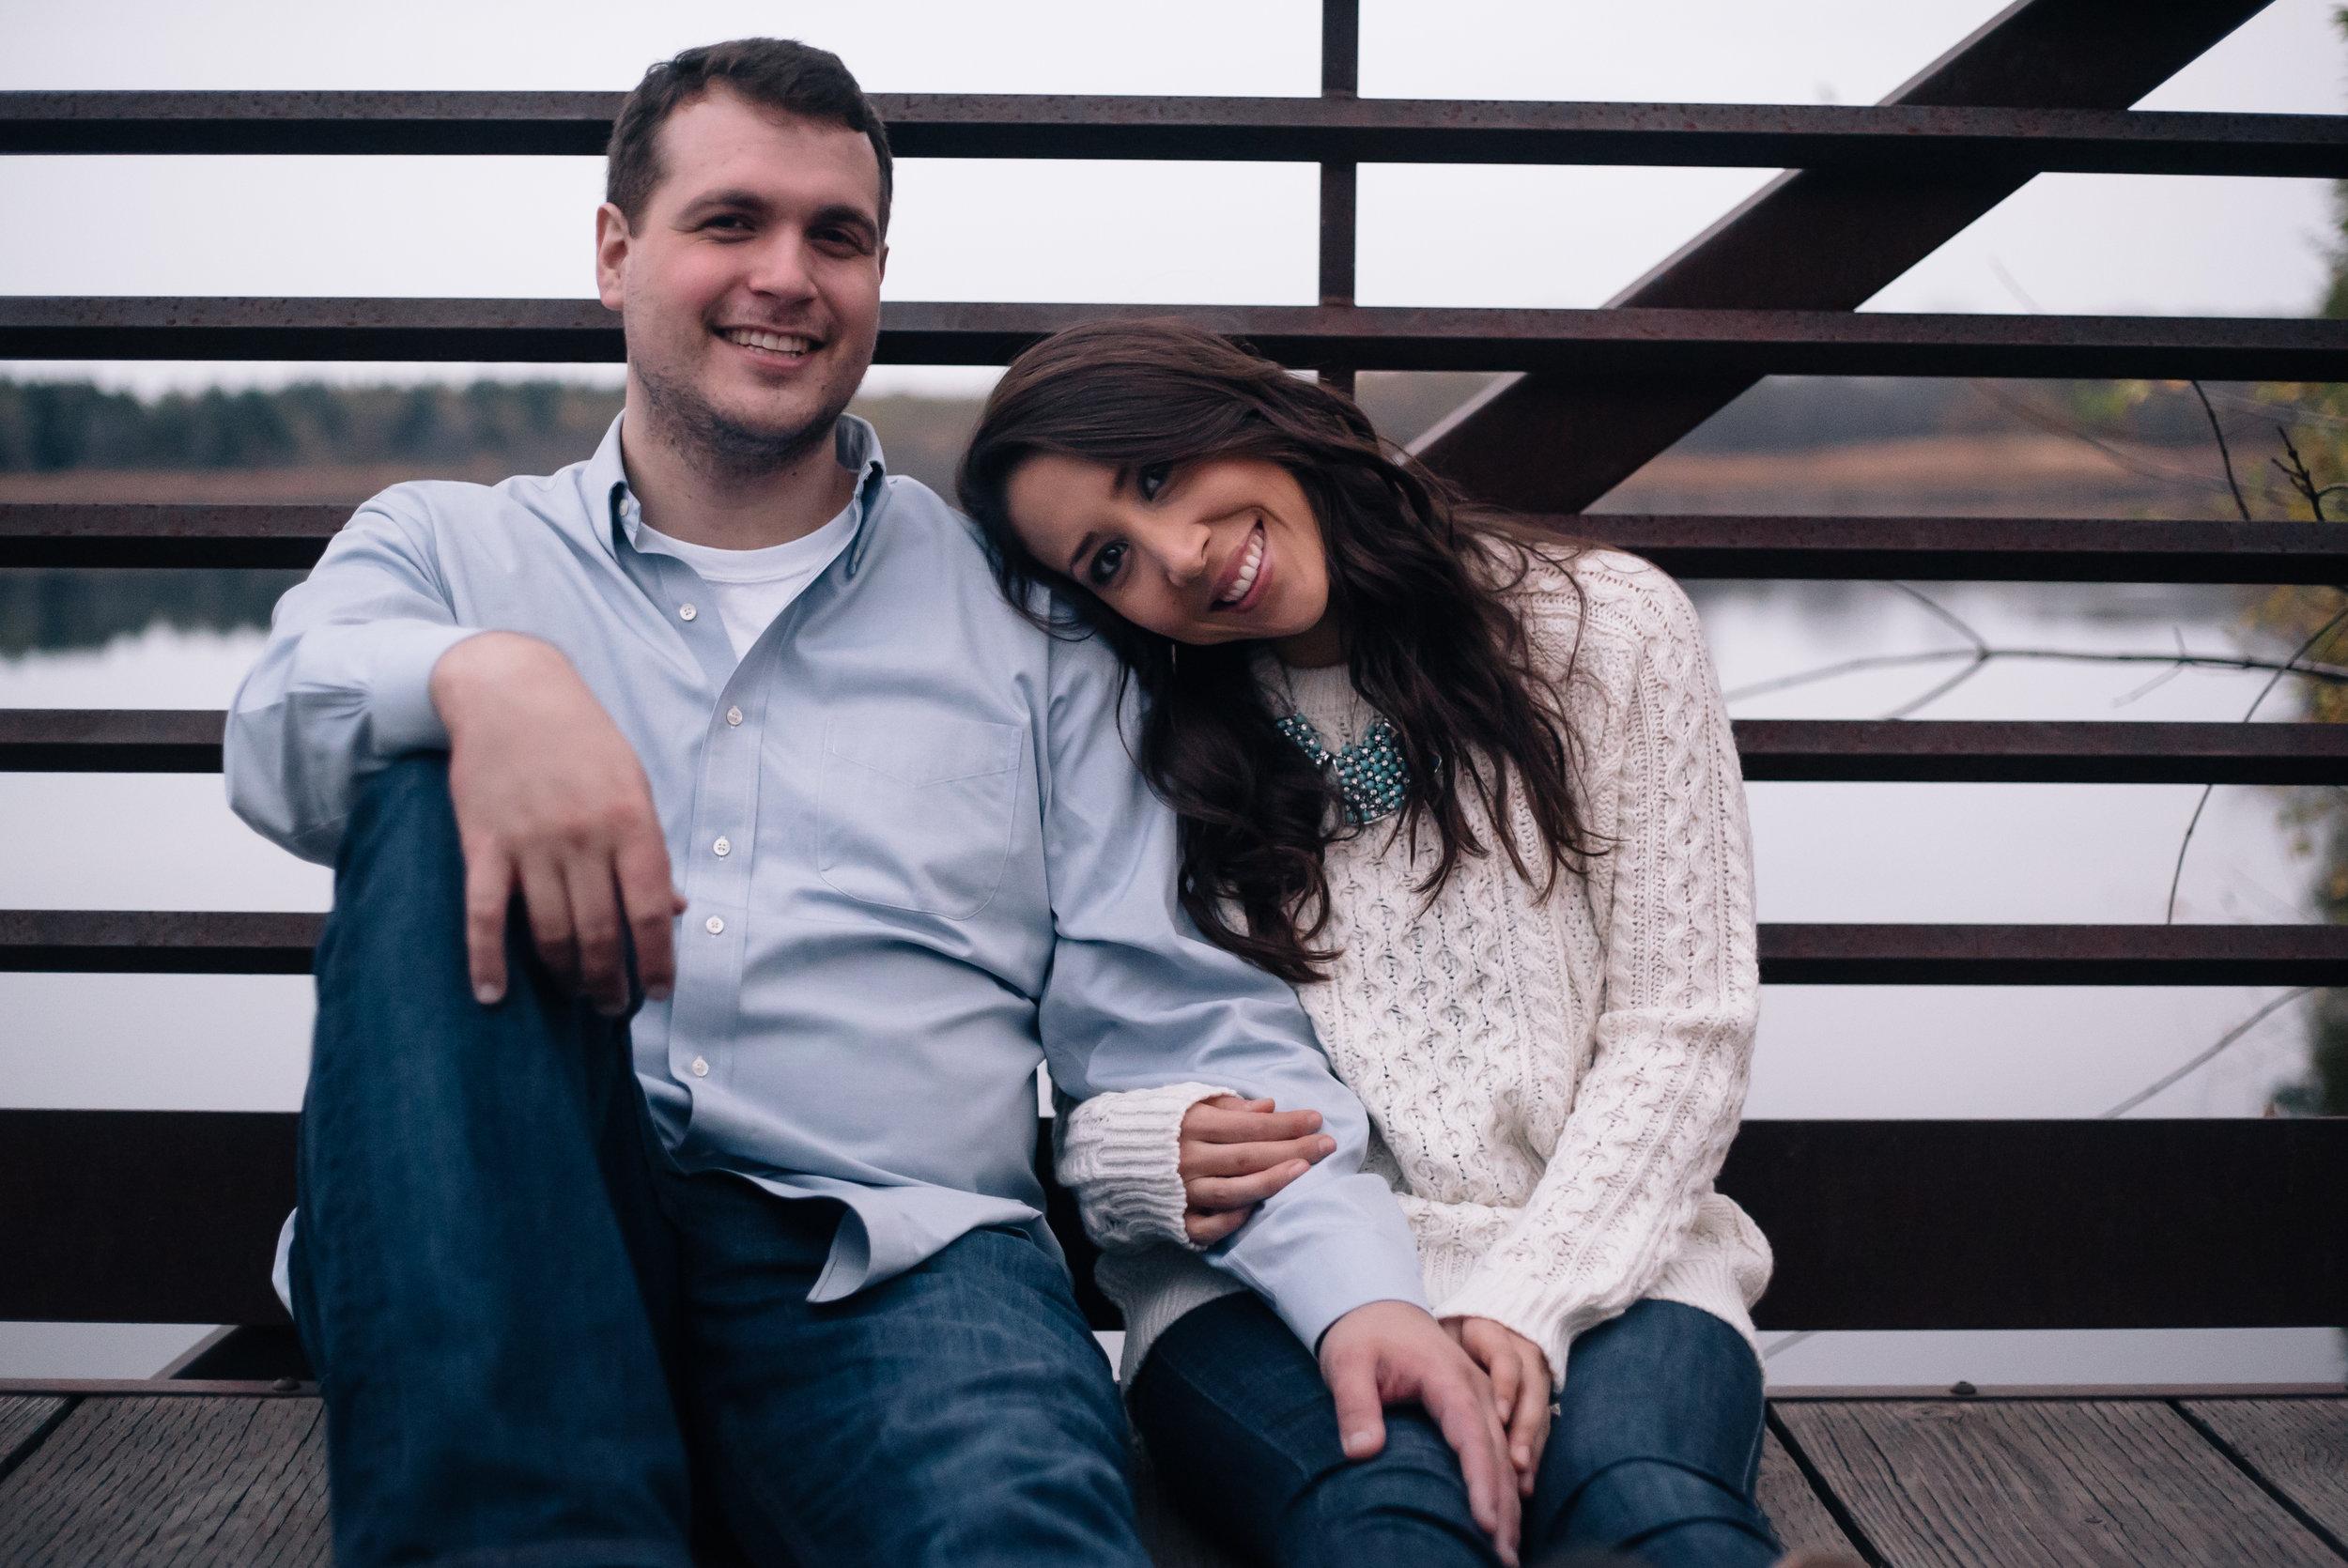 Johnsons Creative | Patrick + Lynn, Engagement Photos, Photography, Cedar Falls, Iowa, Midwest